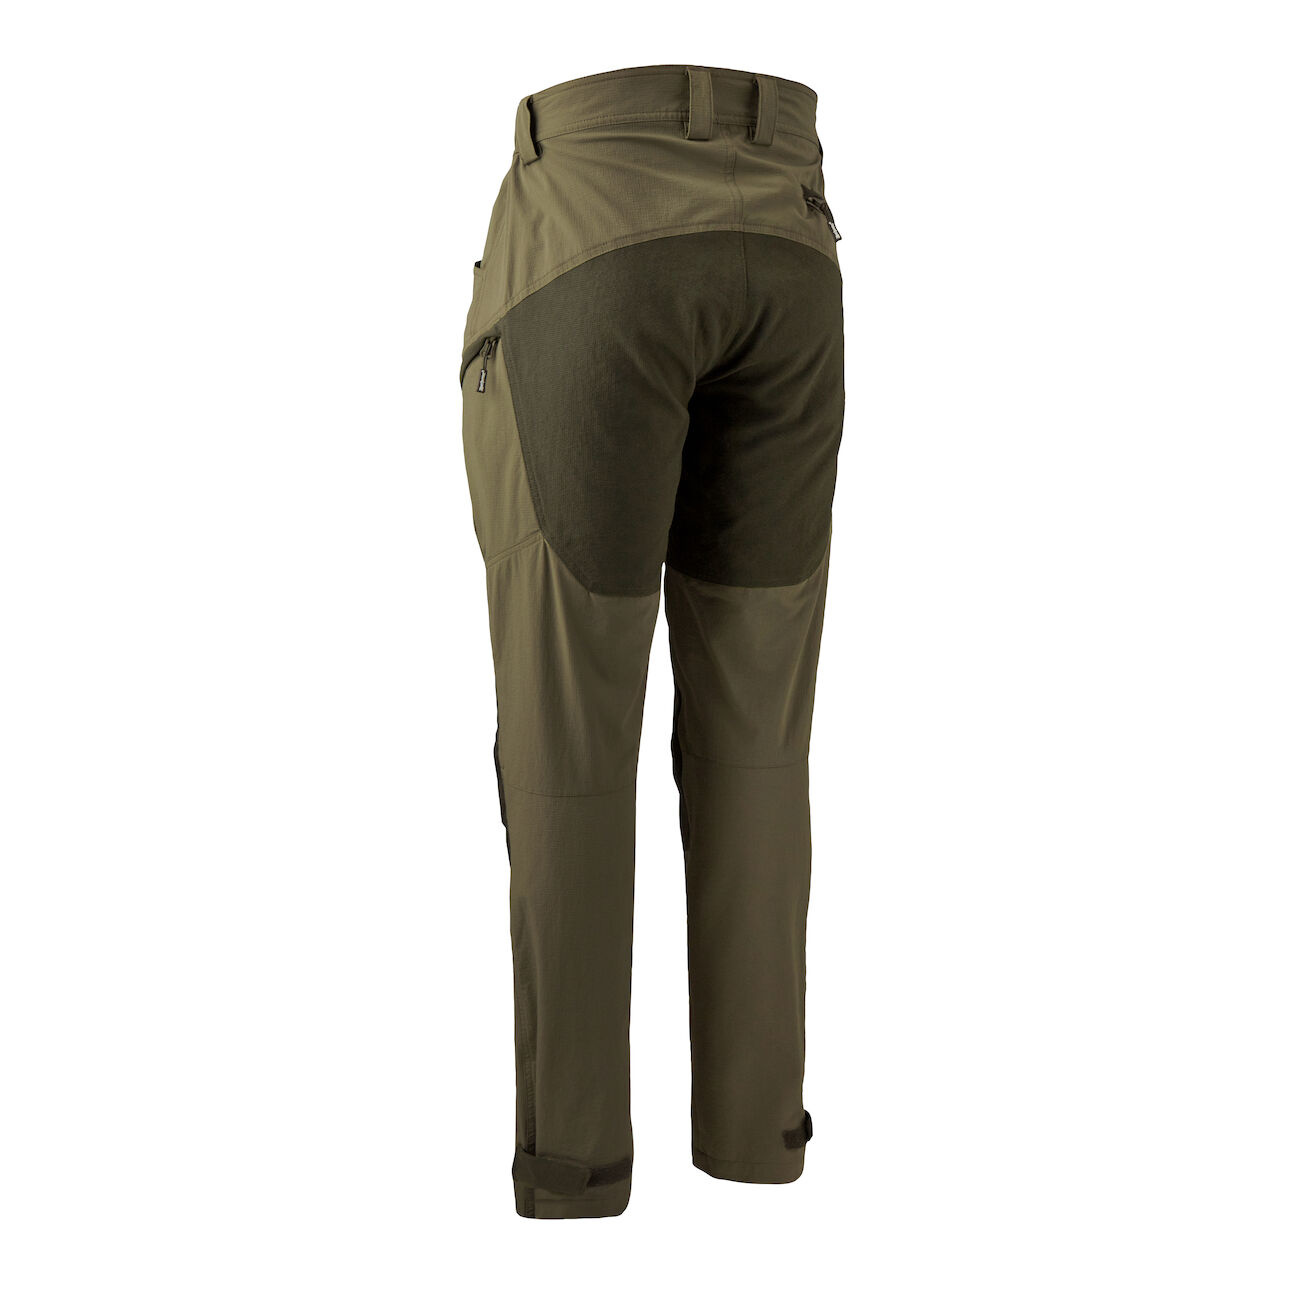 Deerhunter Buggy-Hose Anti-Insekten-Hose mit HHL-Behandlung